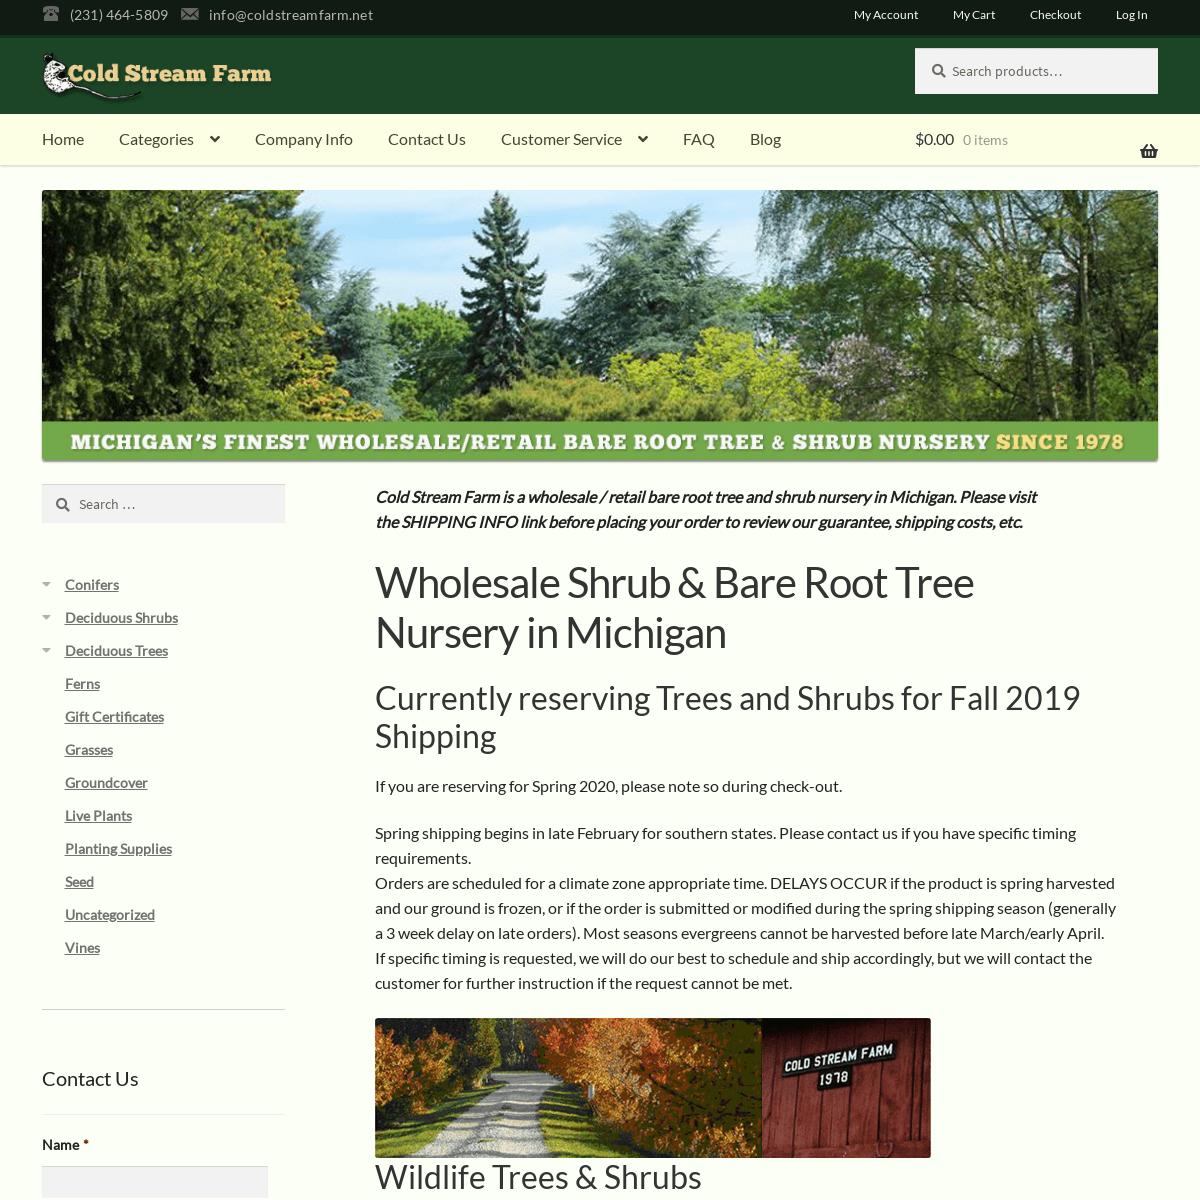 ArchiveBay.com - coldstreamfarm.net - Wholesale Shrub & Bare Root Tree Nursery in Michigan - Cold Stream Farm